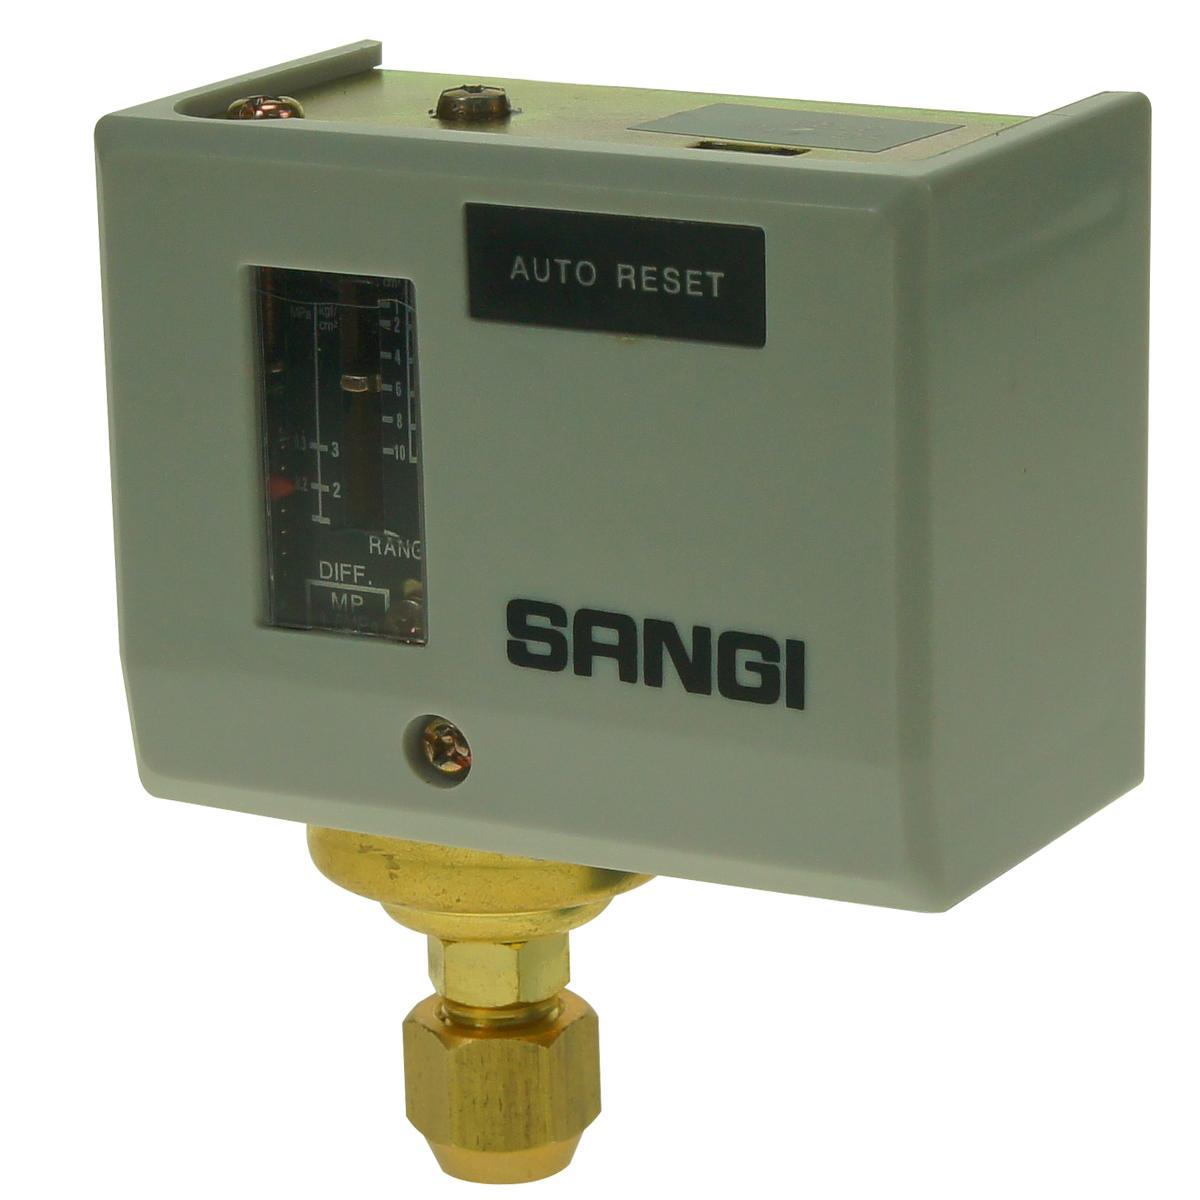 IMARI IM-200 Series สวิทช์ควบคุมความดัน